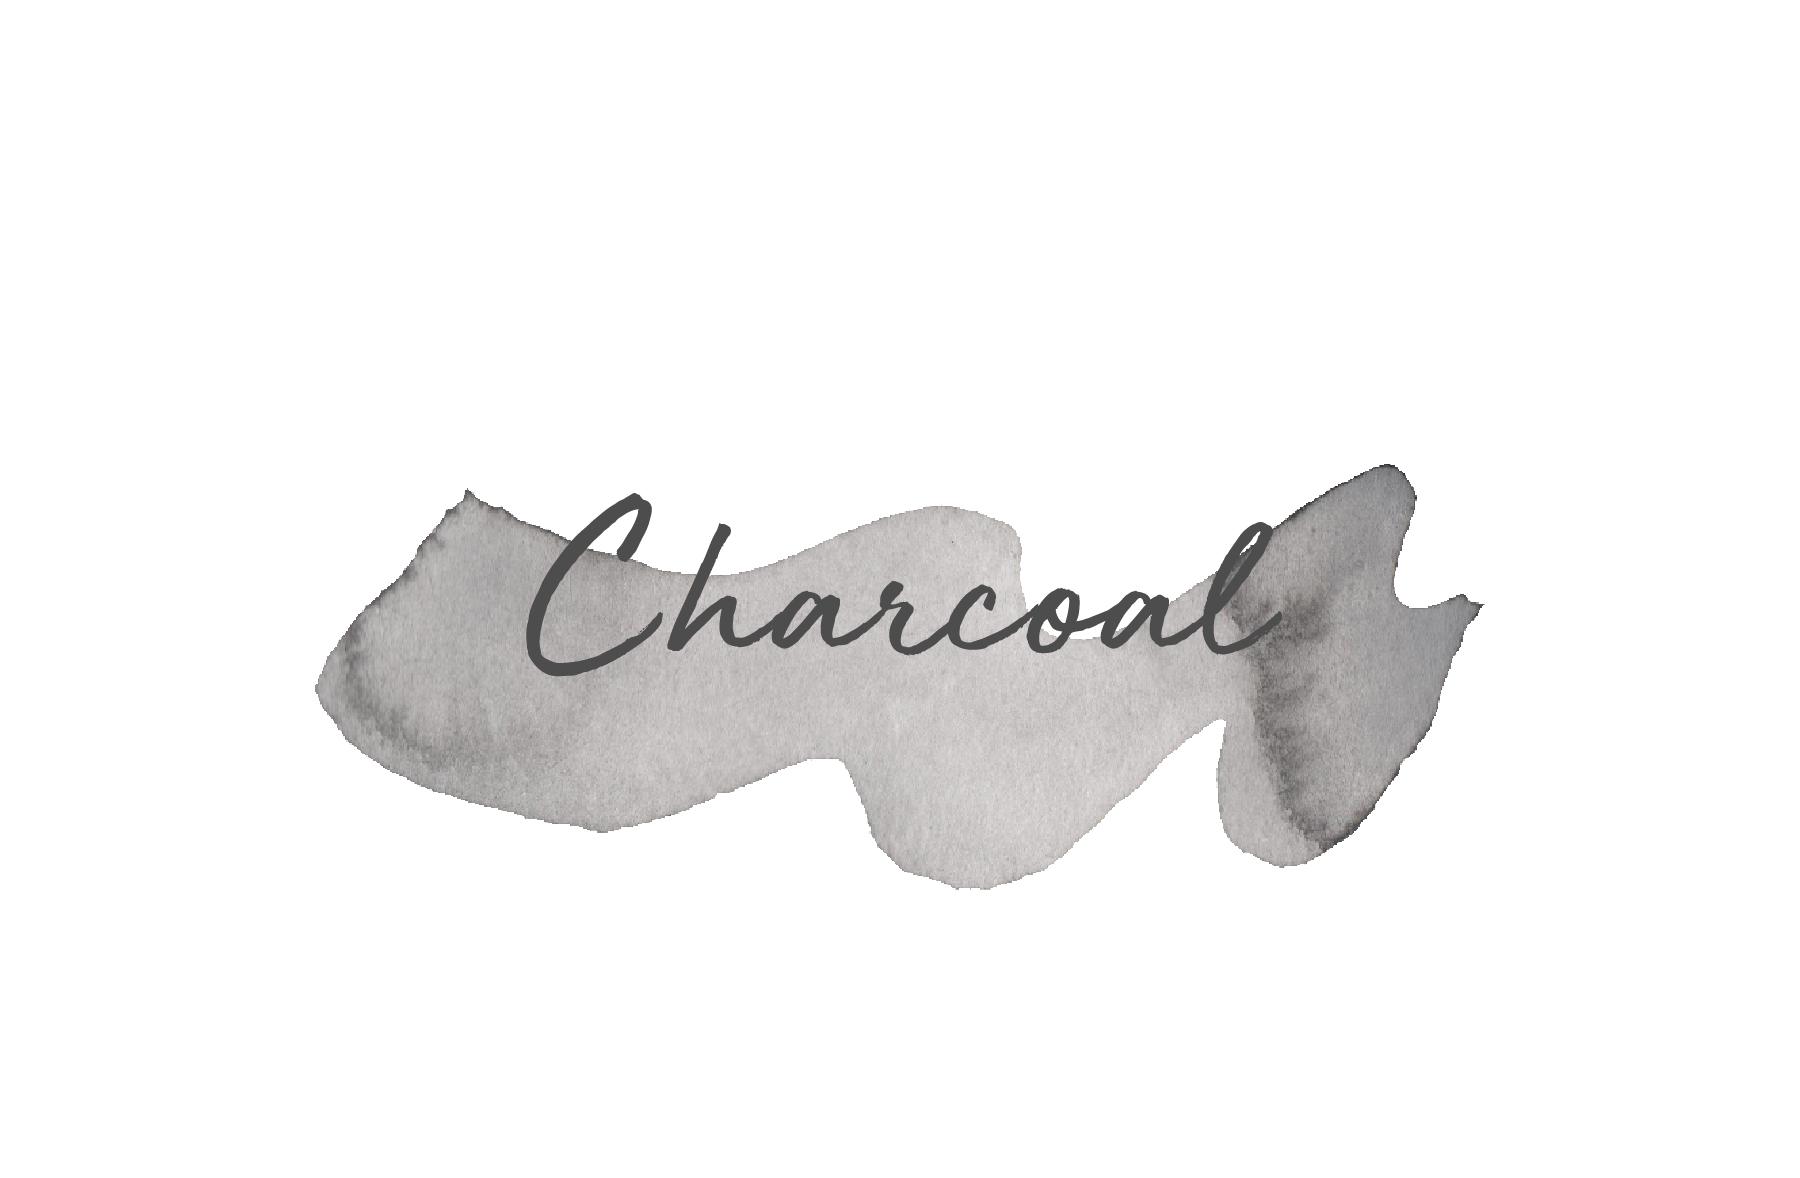 CharcoalIcon.jpg